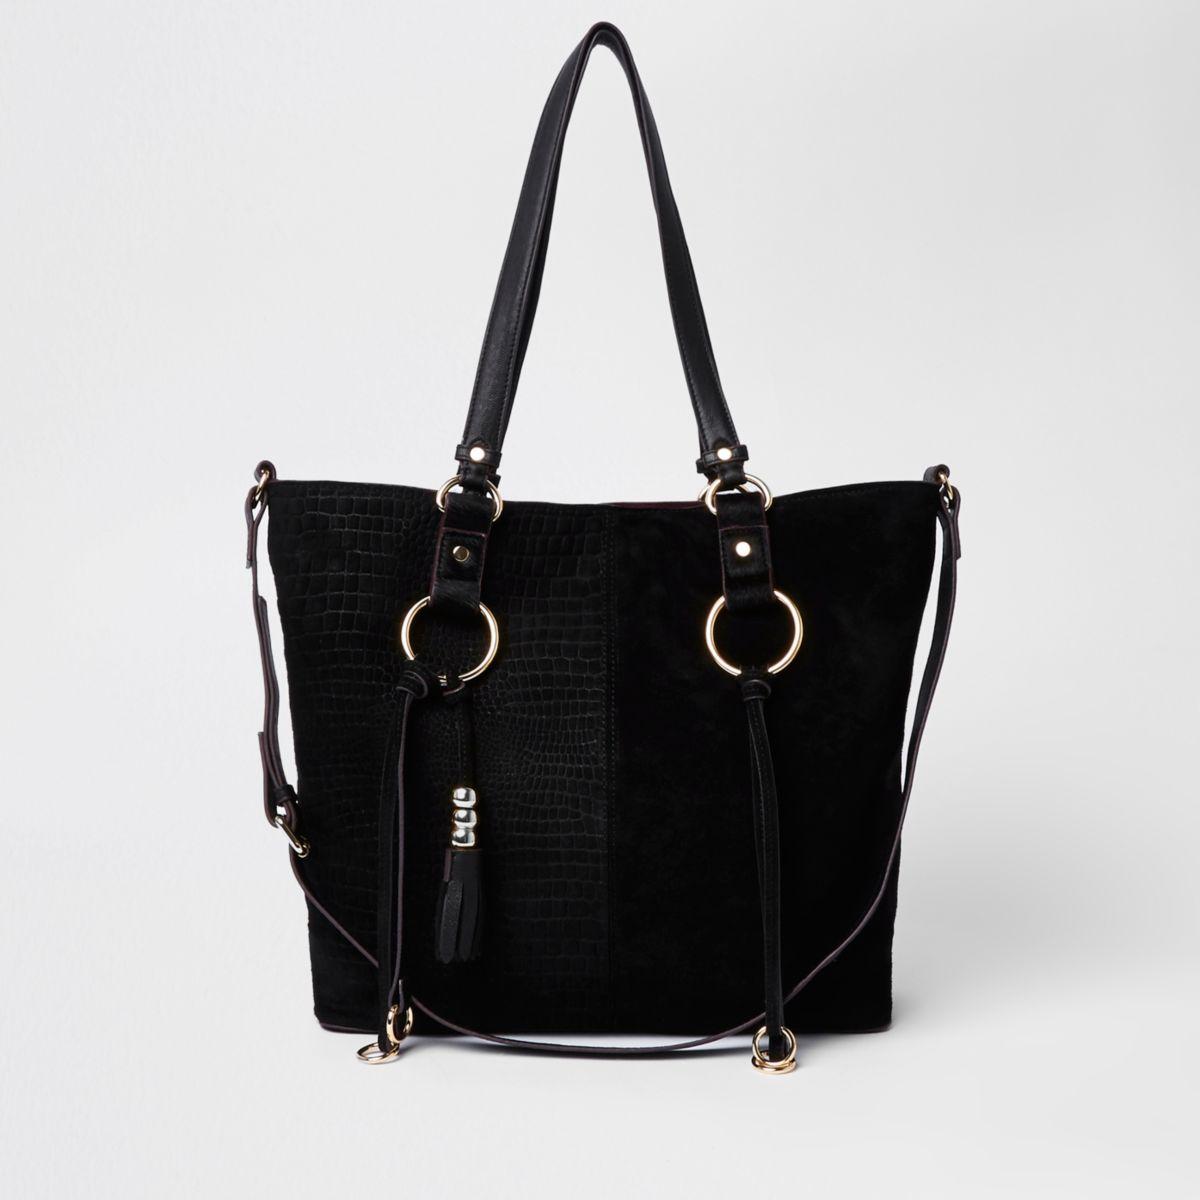 Womens Black suede hoop detail shopper bag River Island NW1nQAaH9